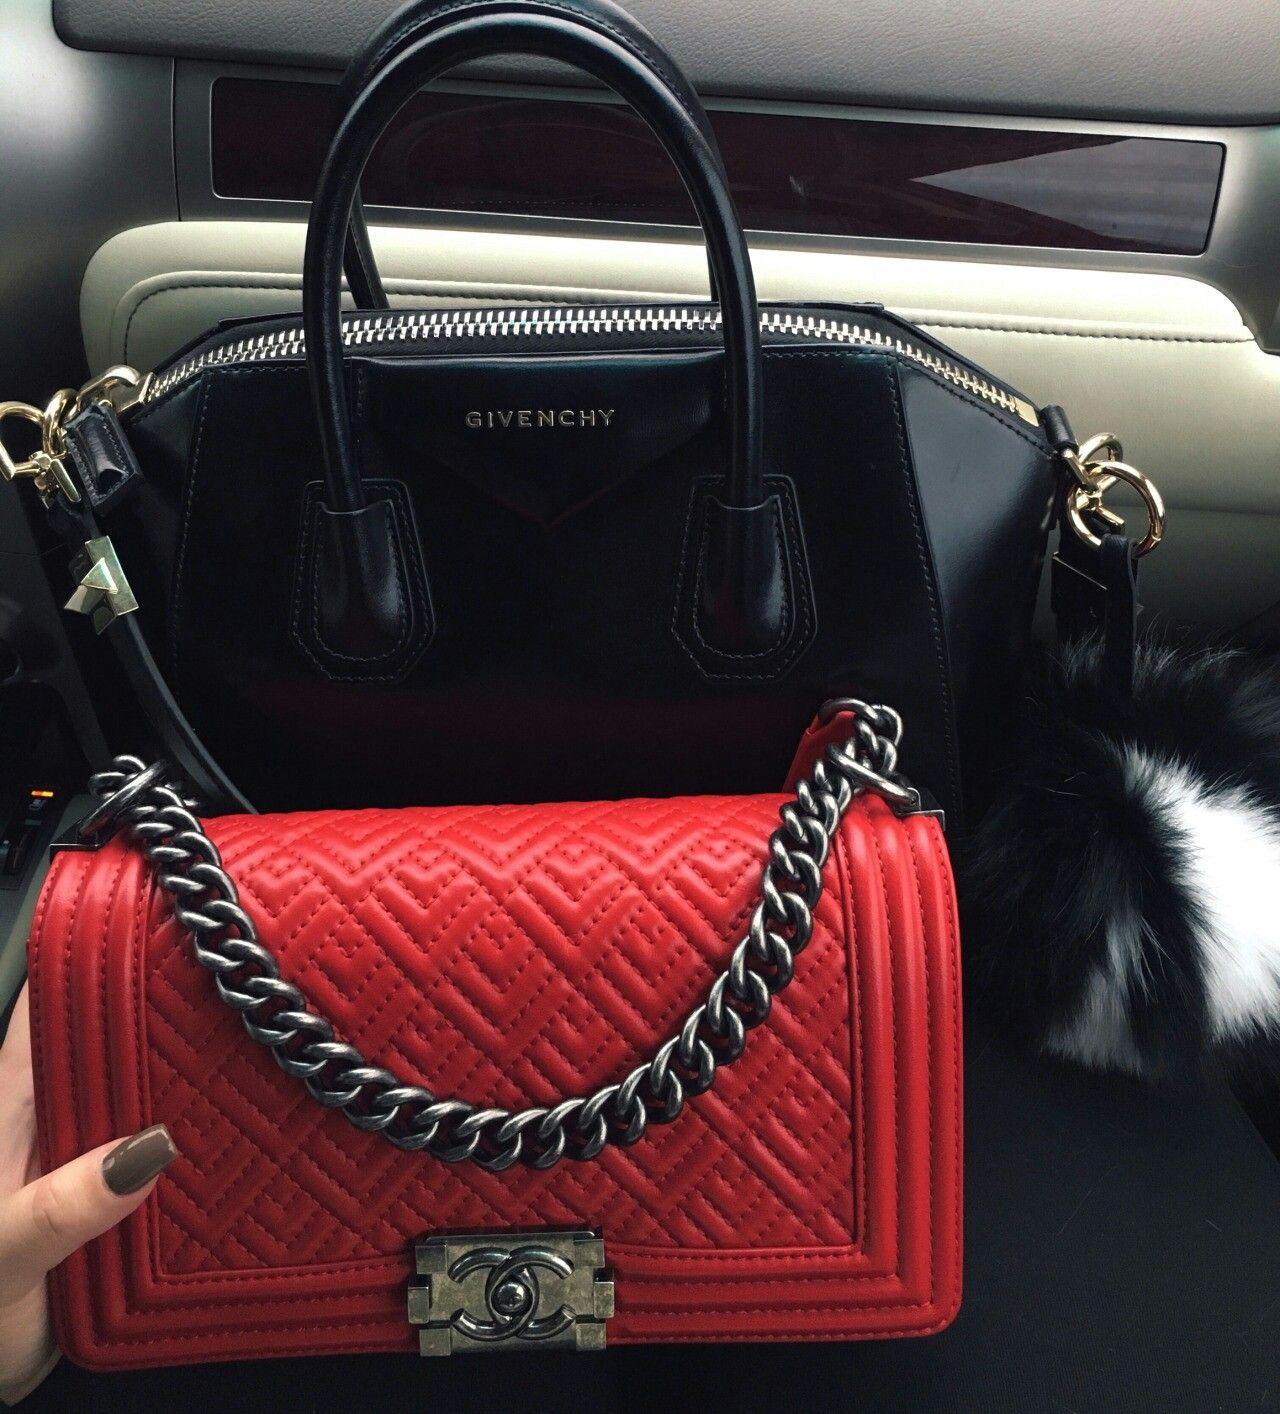 a98a416f7a38 hit the plug.  mariamjijawi · Leather Handbags On SaleChanel BagsChanel  HandbagsLouis Vuitton ...